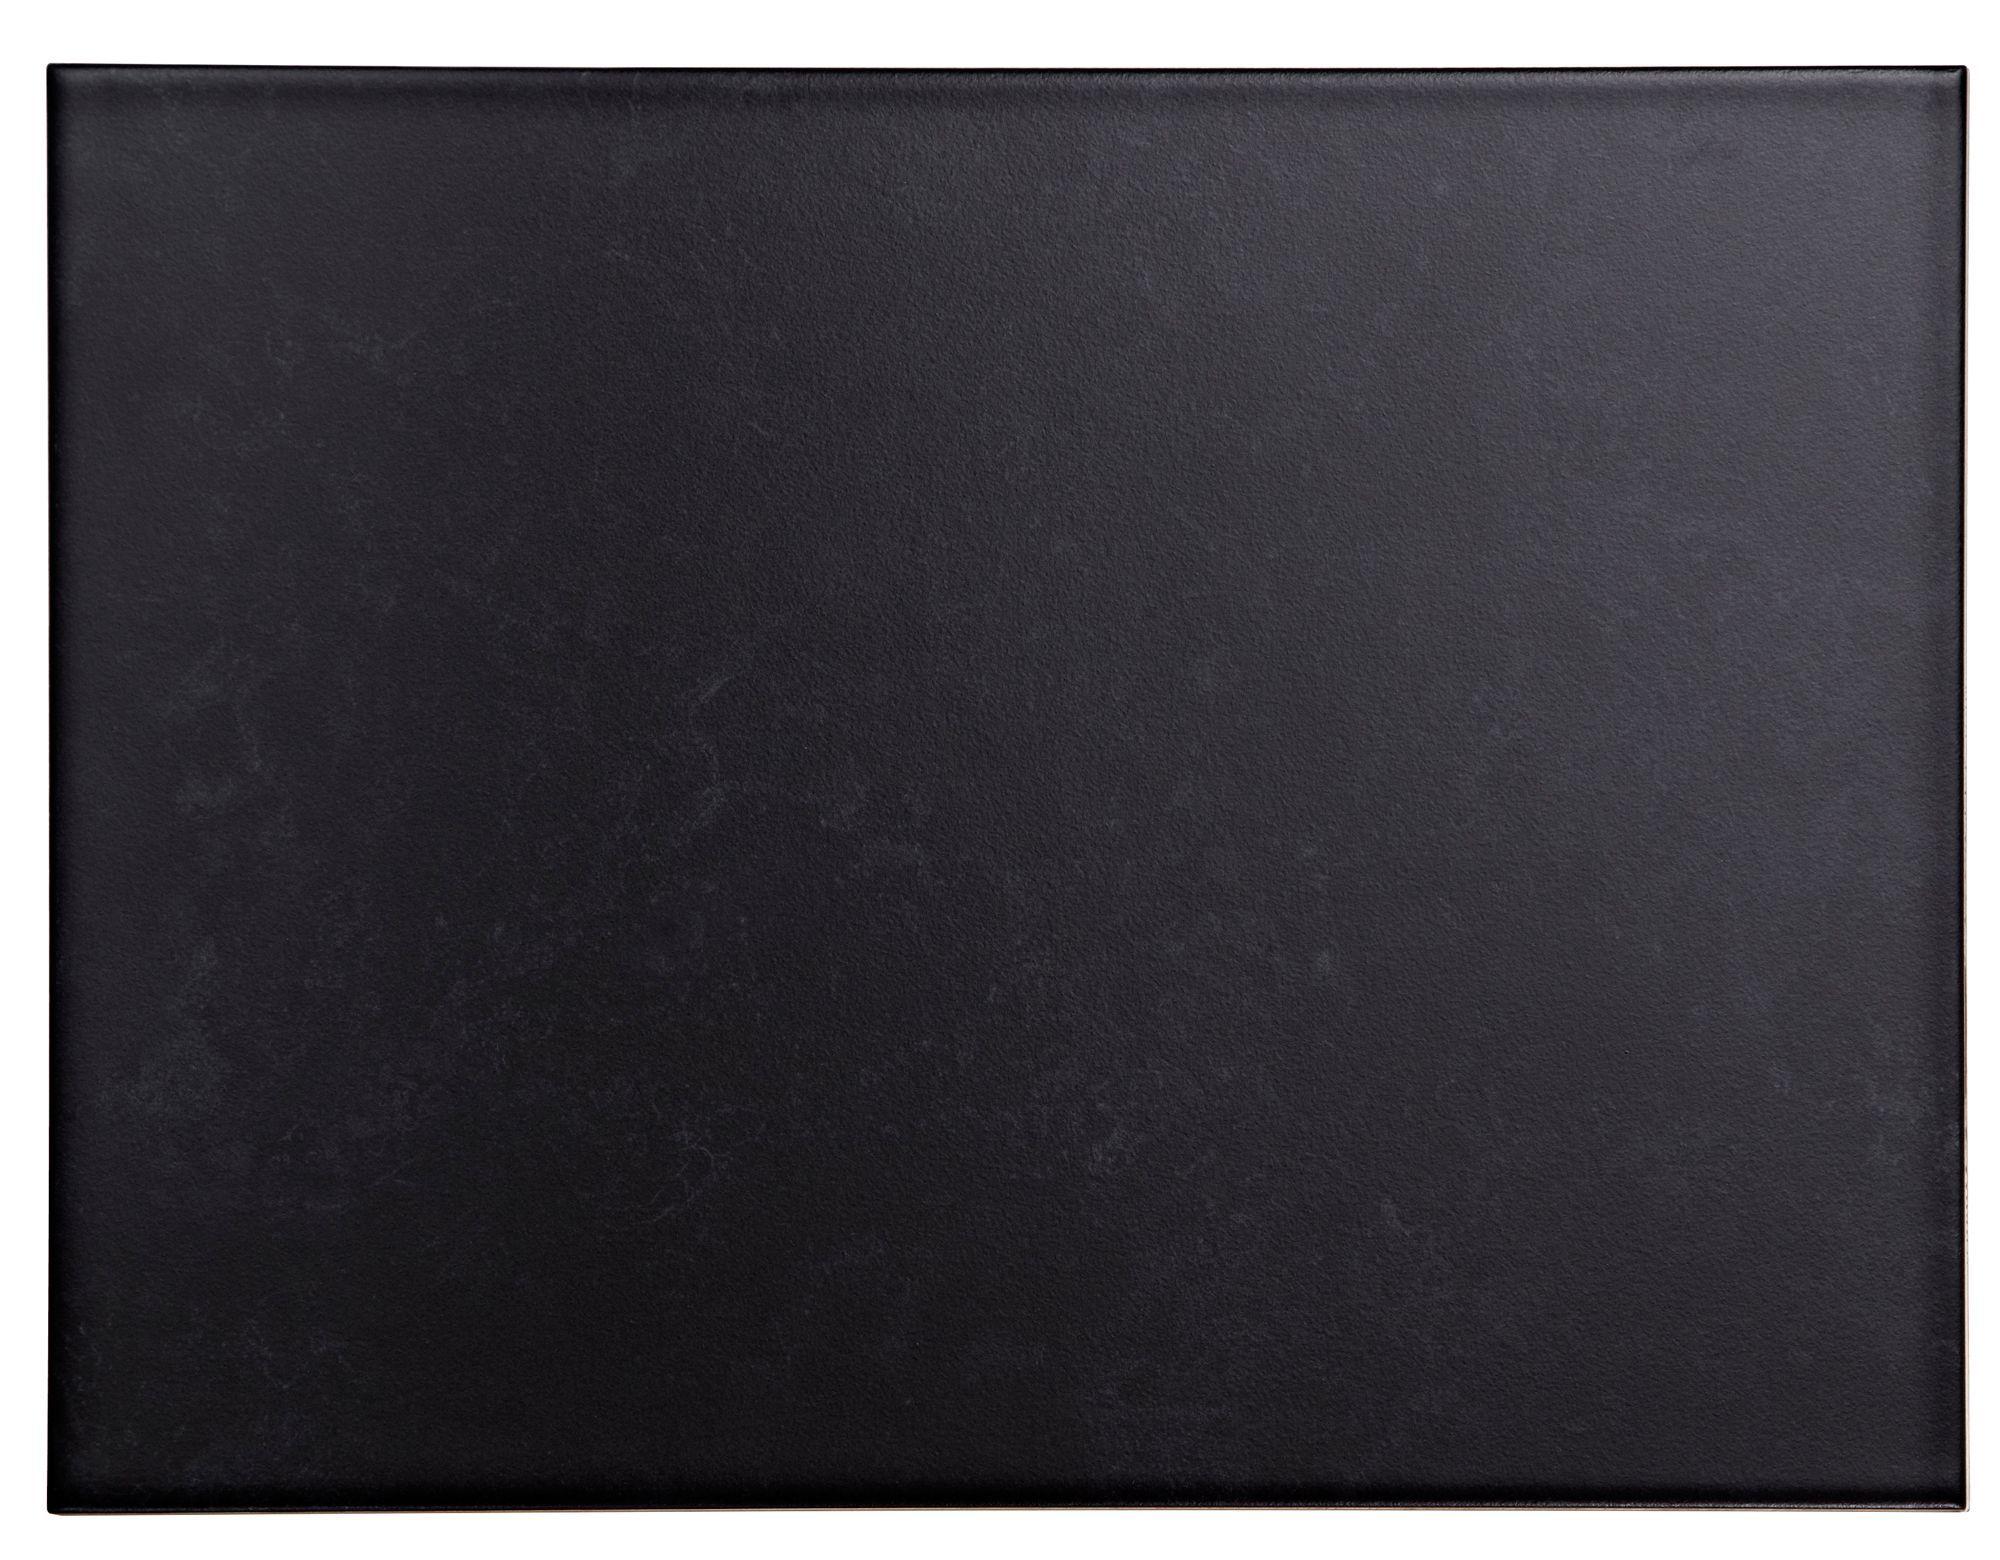 Helena Black Ceramic Wall Tile, Pack Of 12, (l)330mm (w)250mm